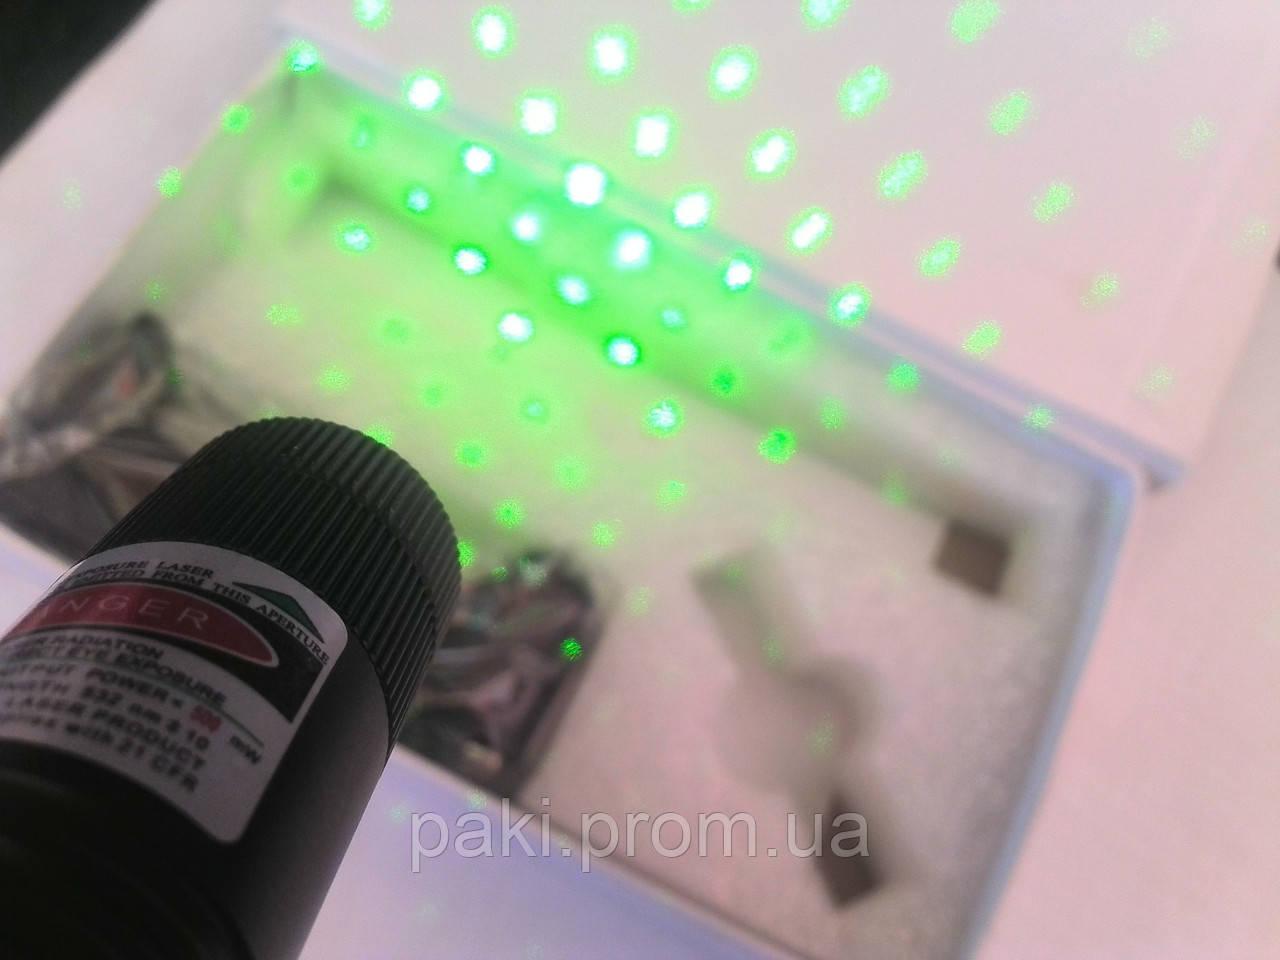 Лазерная указка Green Laser Pointer 303